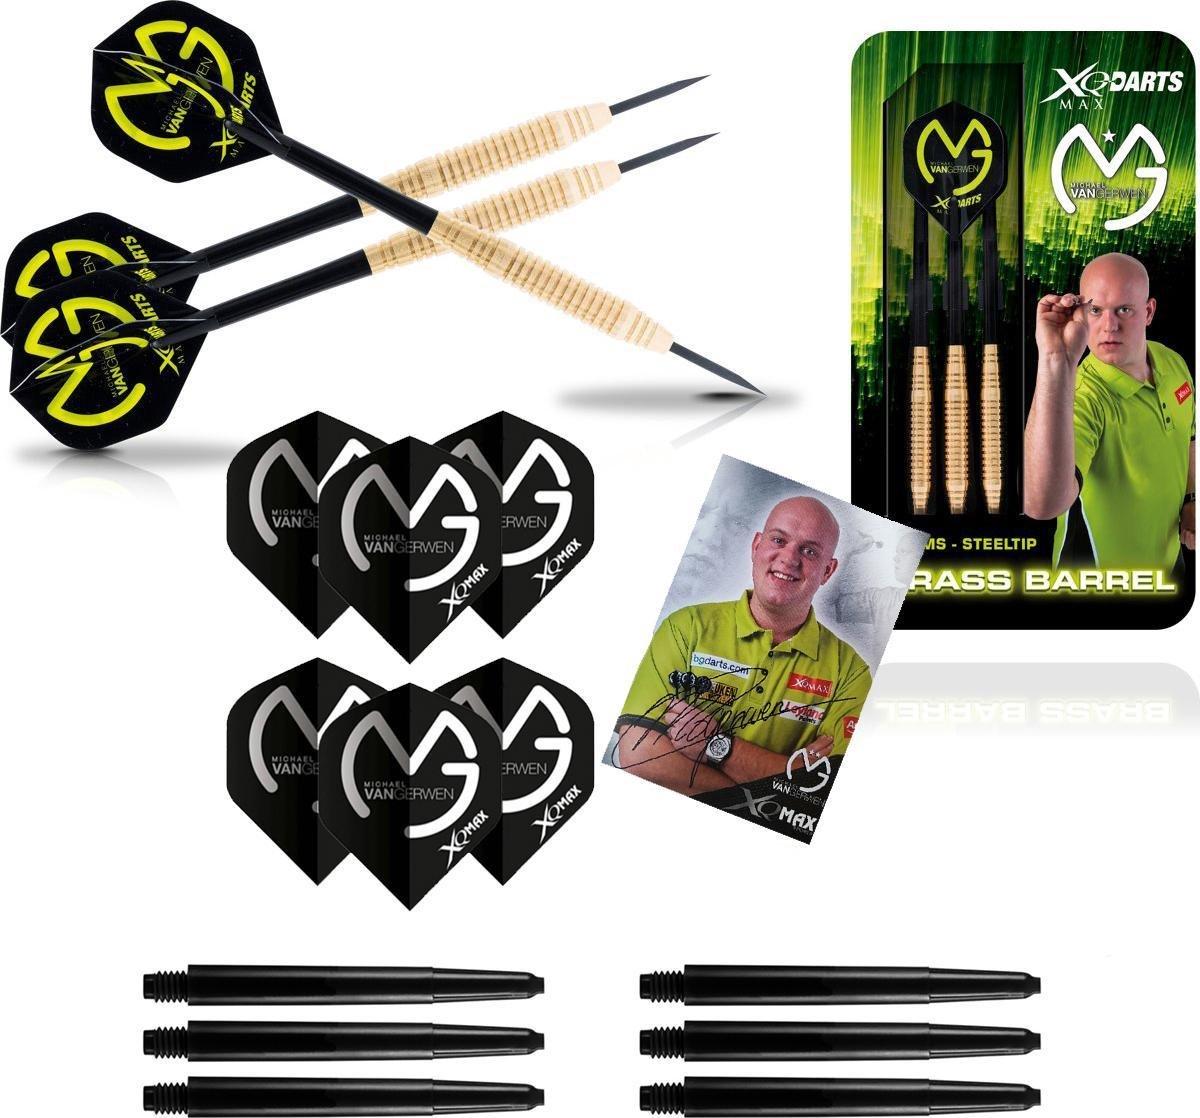 XQ Max - Michael van Gerwen - 20 gram Brass (100% NETT) - dartpijlen - inclusief extra originele - darts shafts - en - darts flights